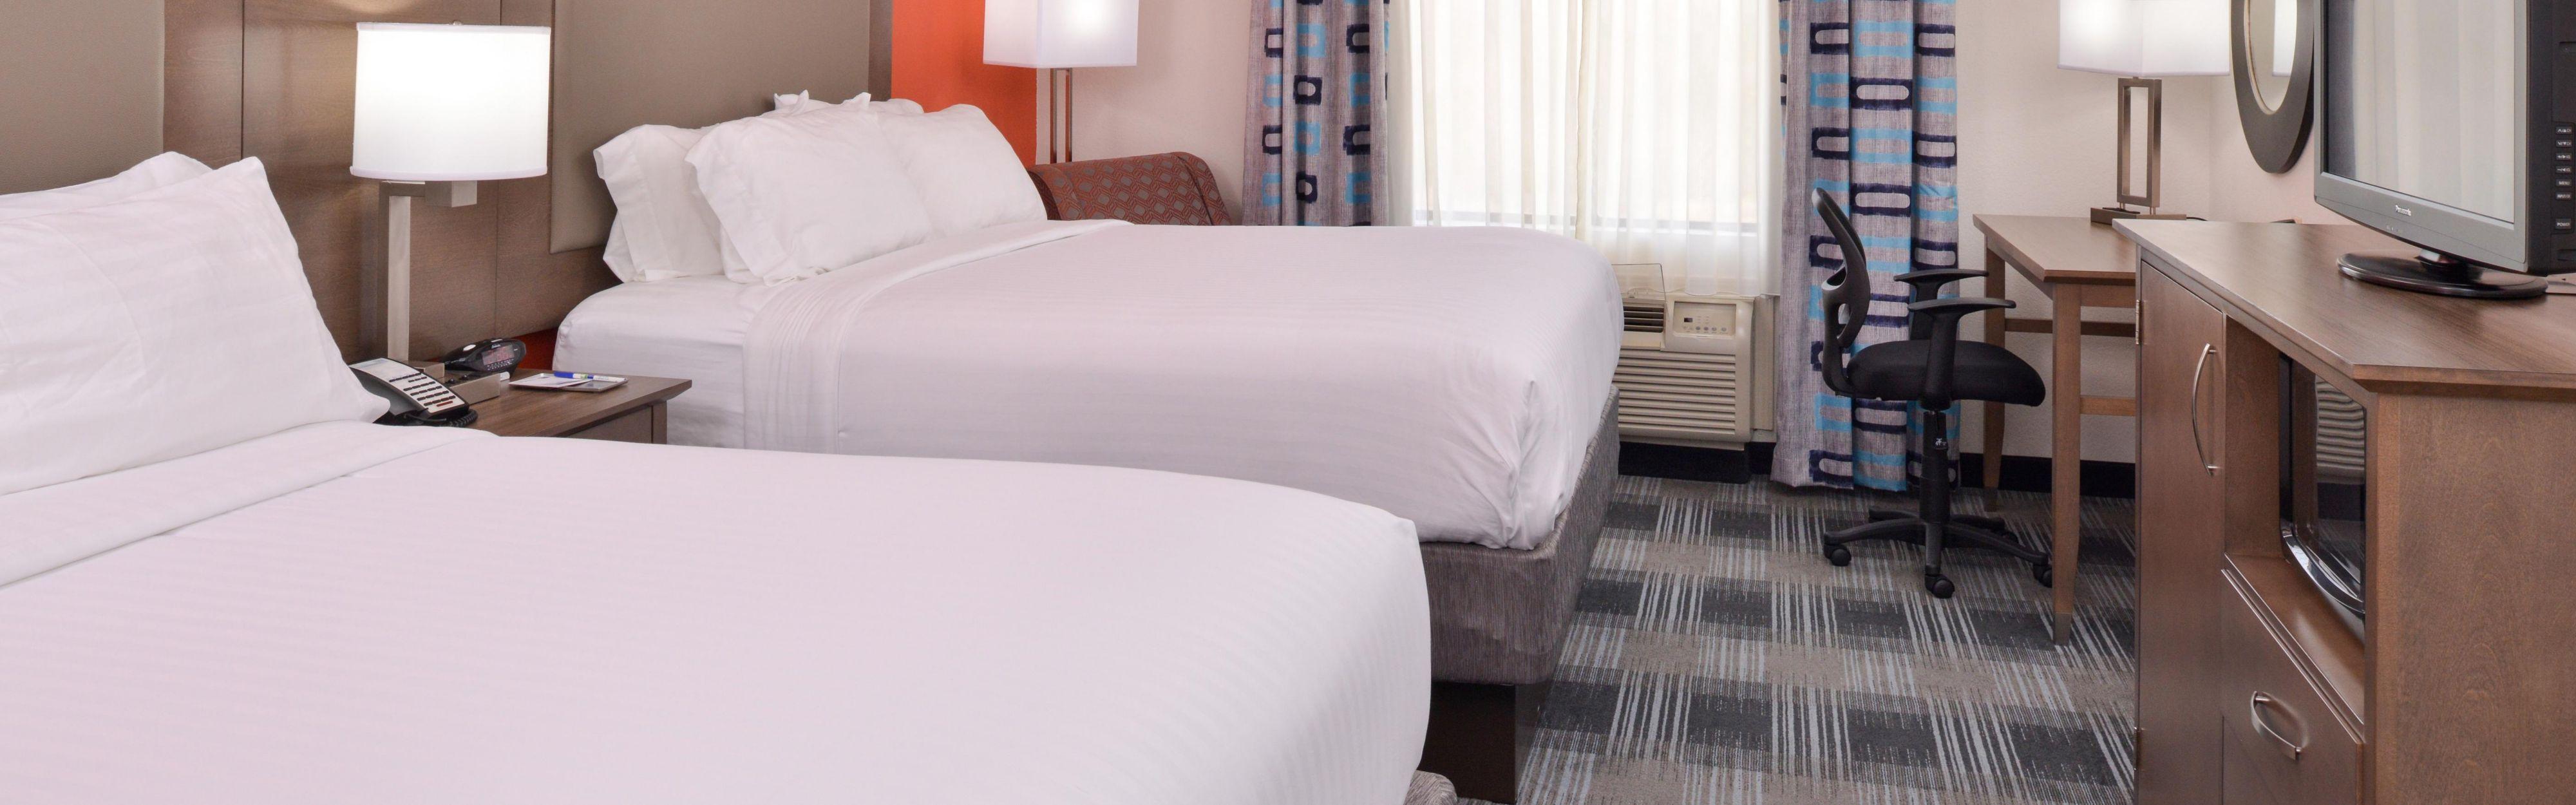 Holiday Inn Express Clanton image 1